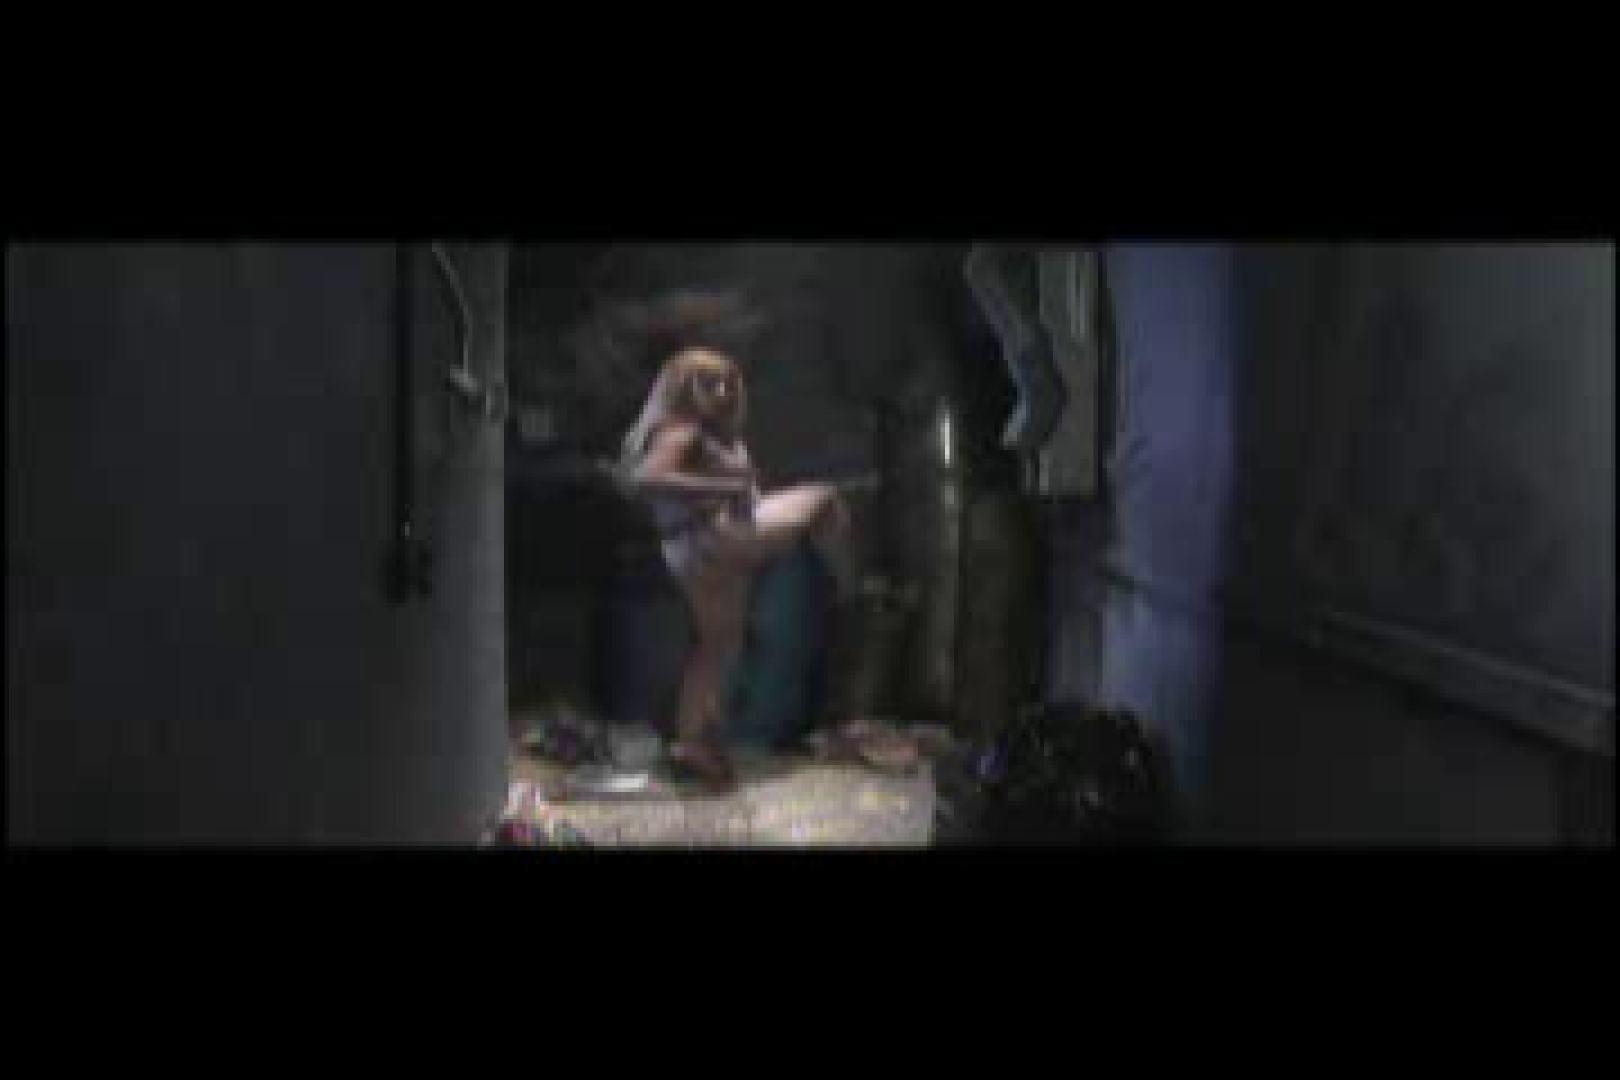 WORLD NEW HALF vol3 ノンケ達のセックス ゲイ無修正画像 54画像 2